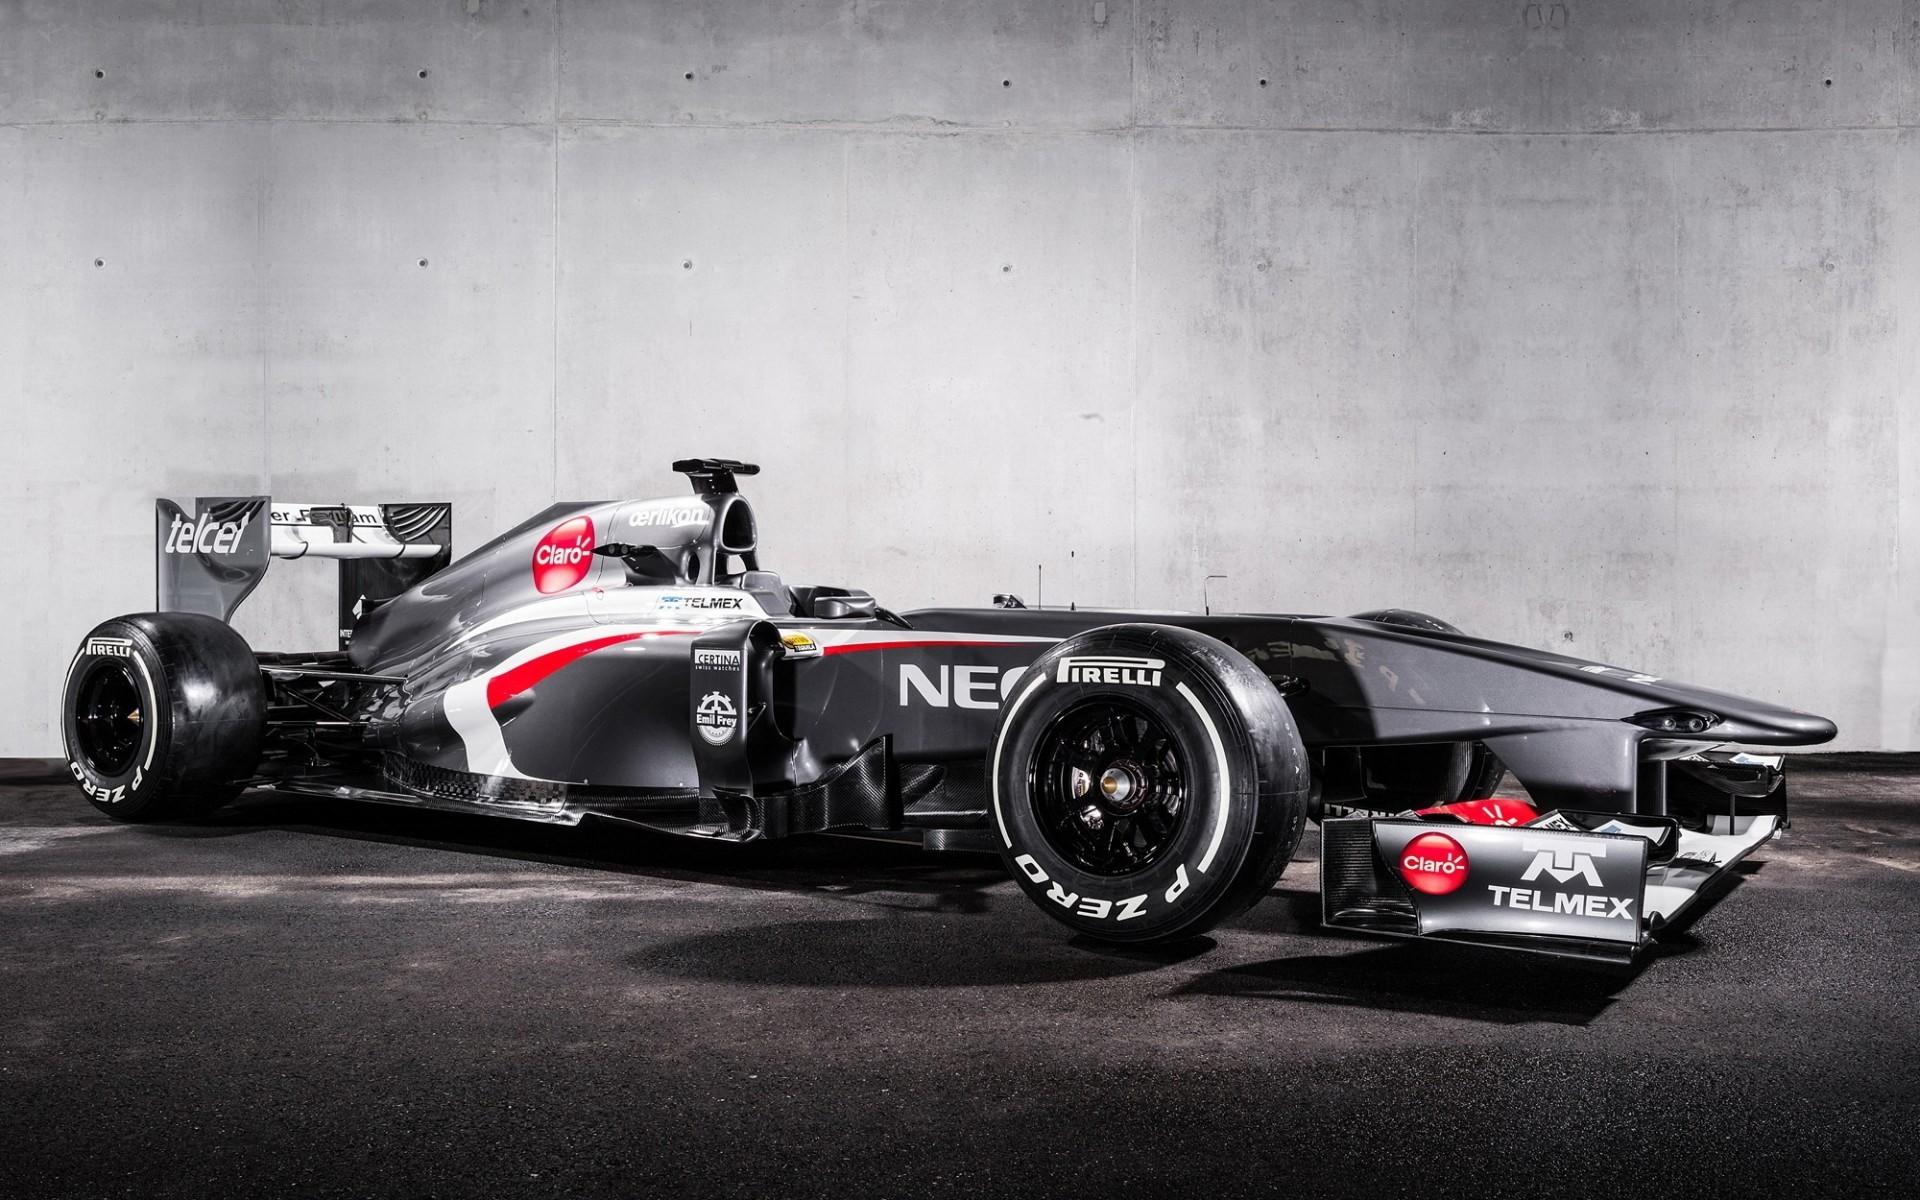 Formula 1 Race Car Wallpaper 44693